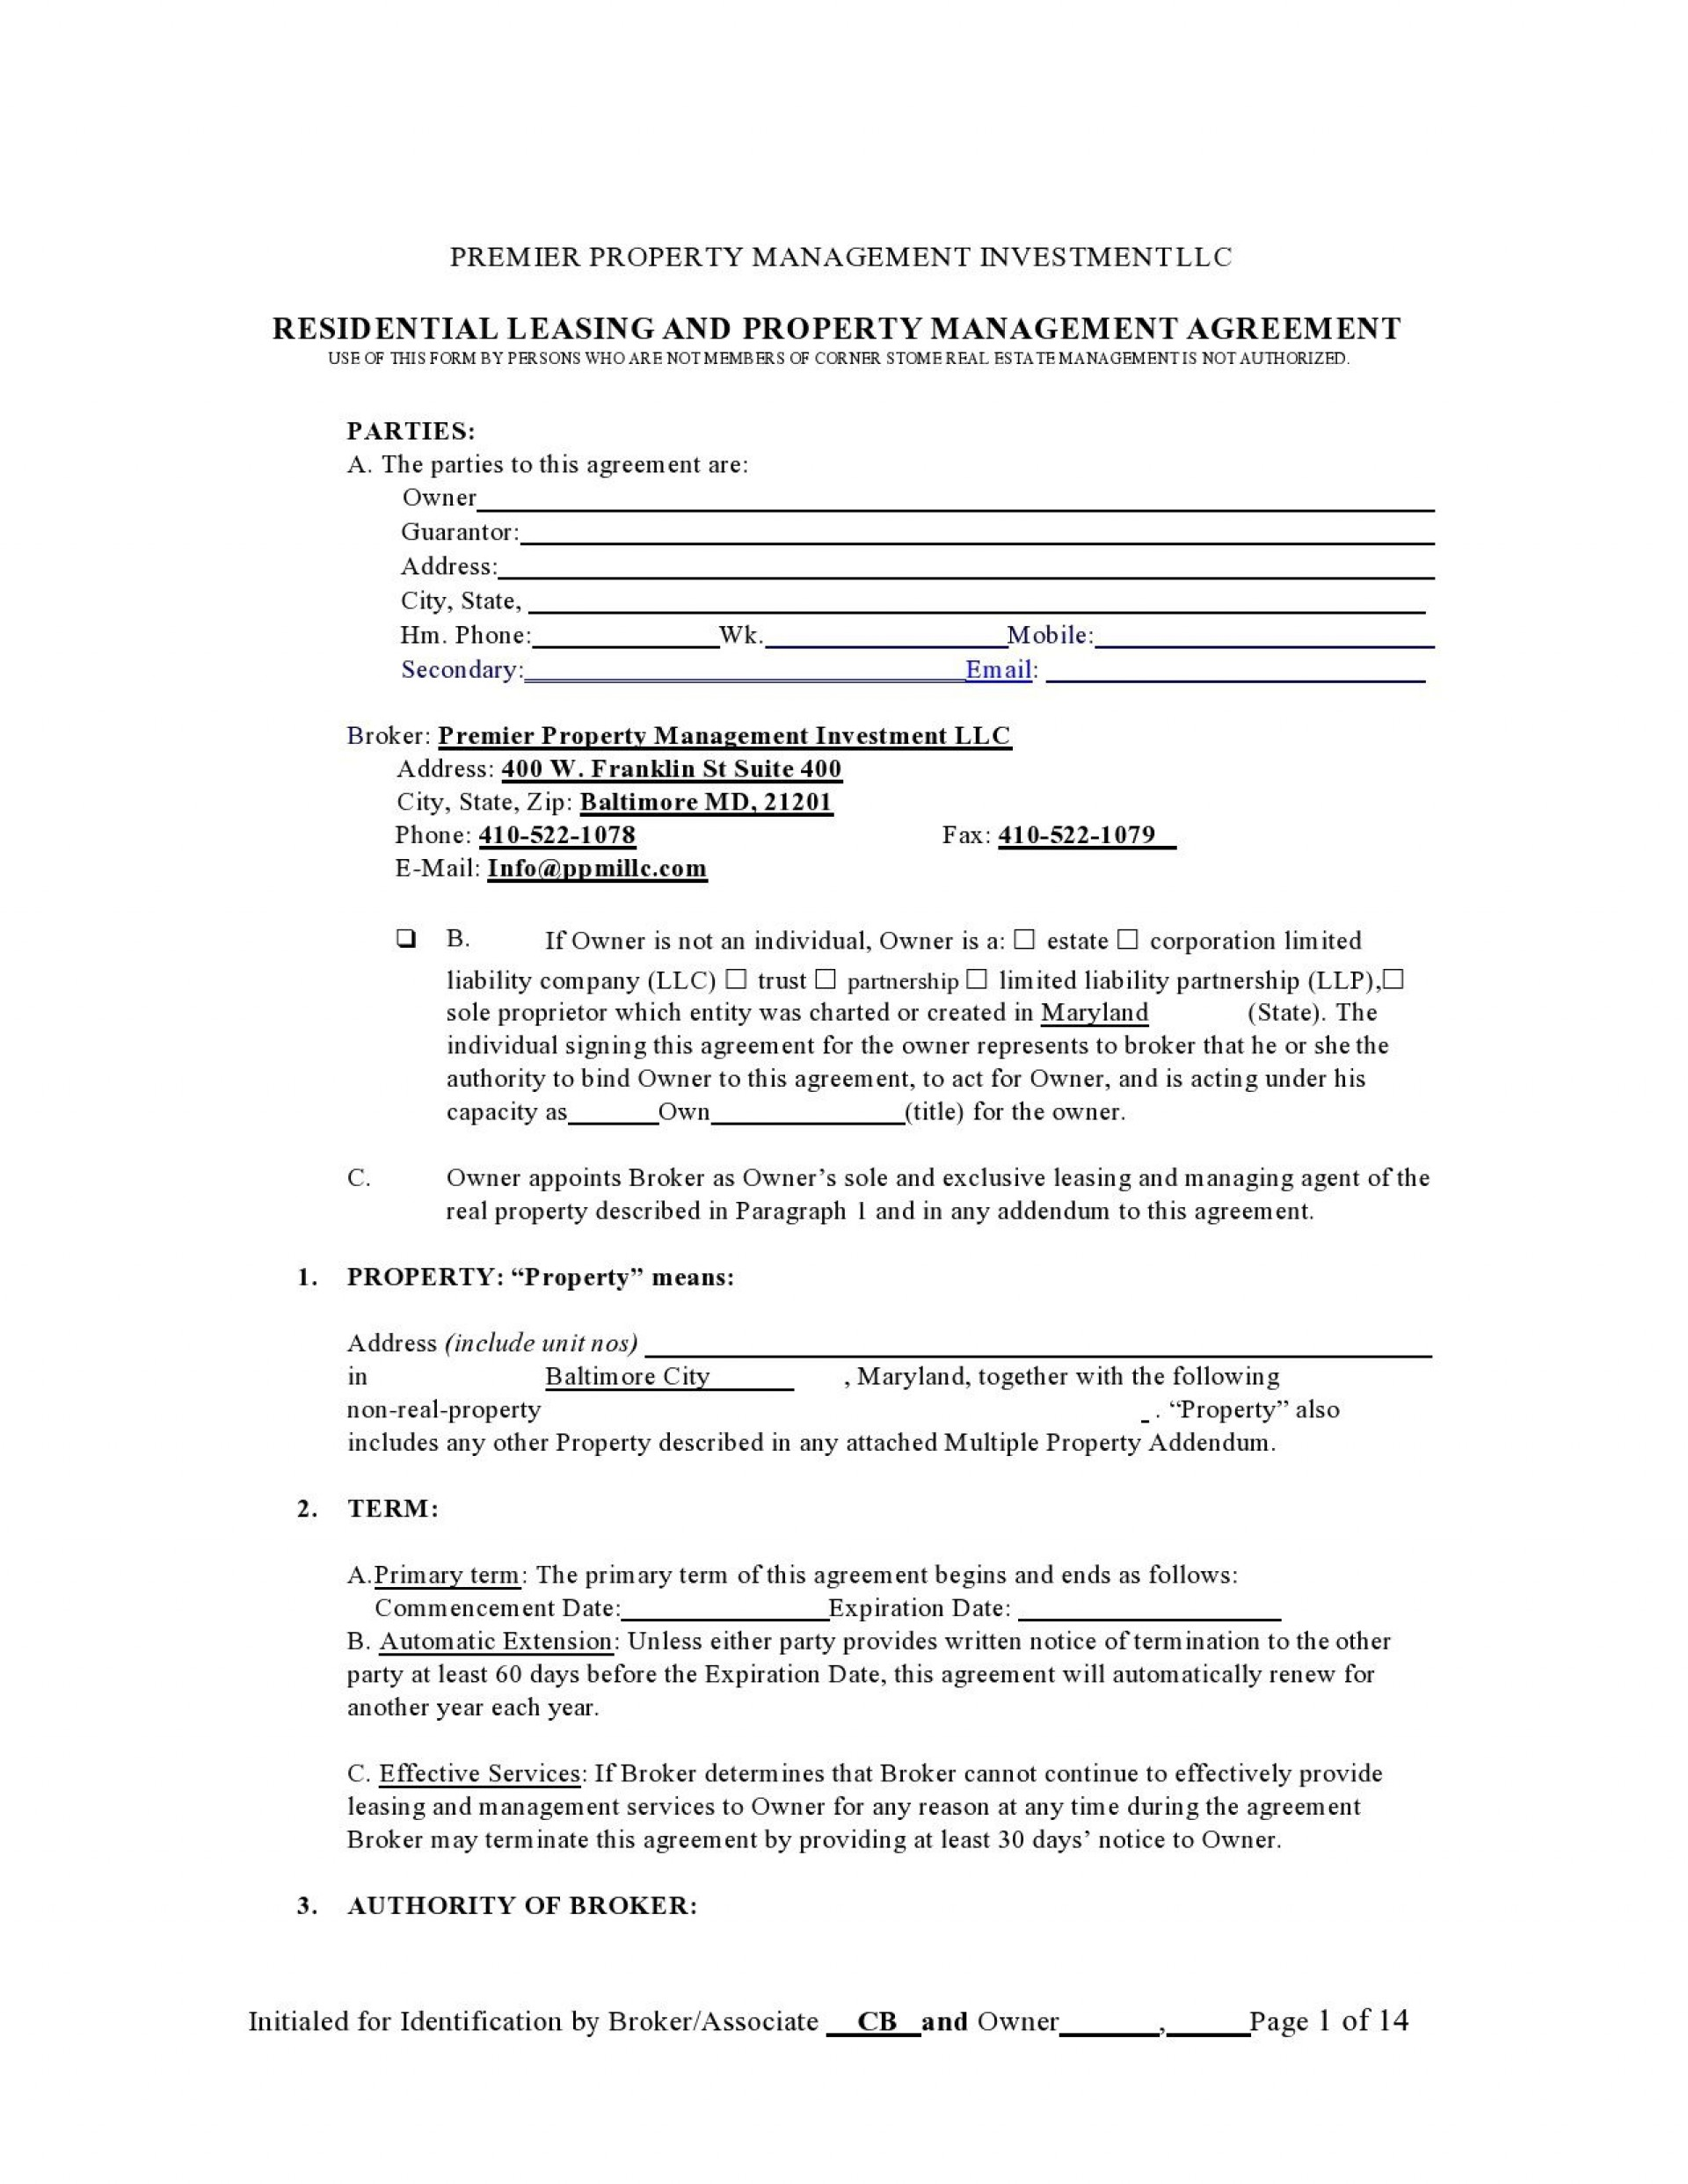 004 Impressive Commercial Property Management Agreement Template Uk Concept 1920